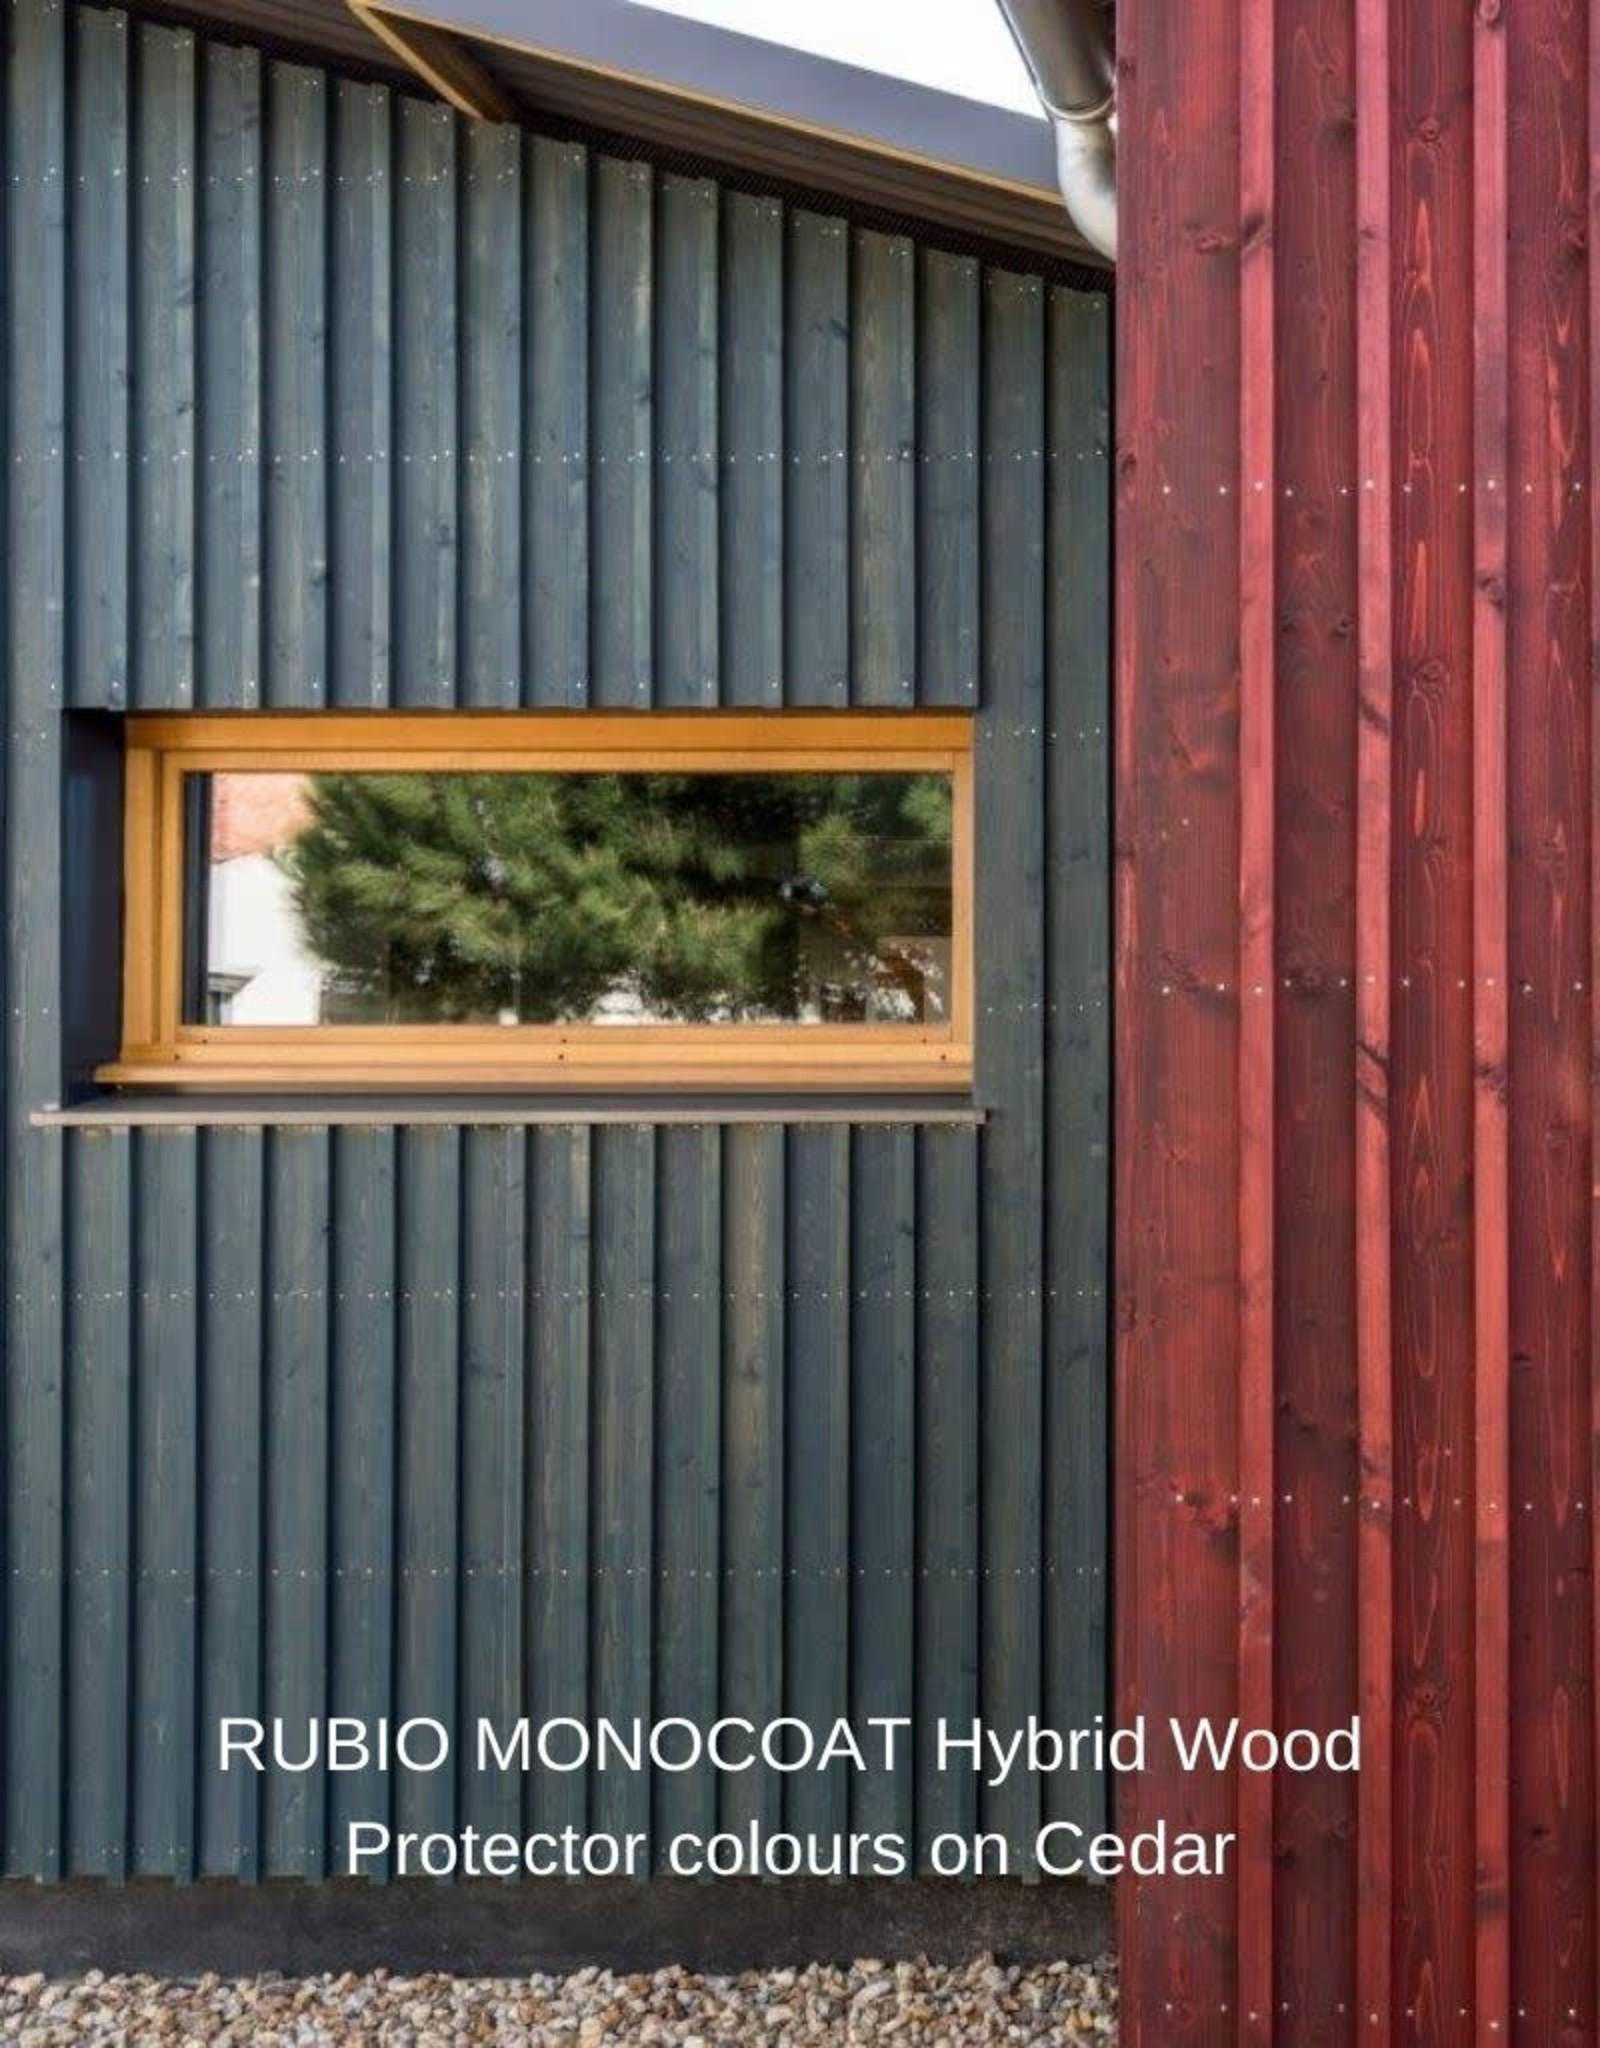 RUBIO MONOCOAT Hybrid Wood Protector